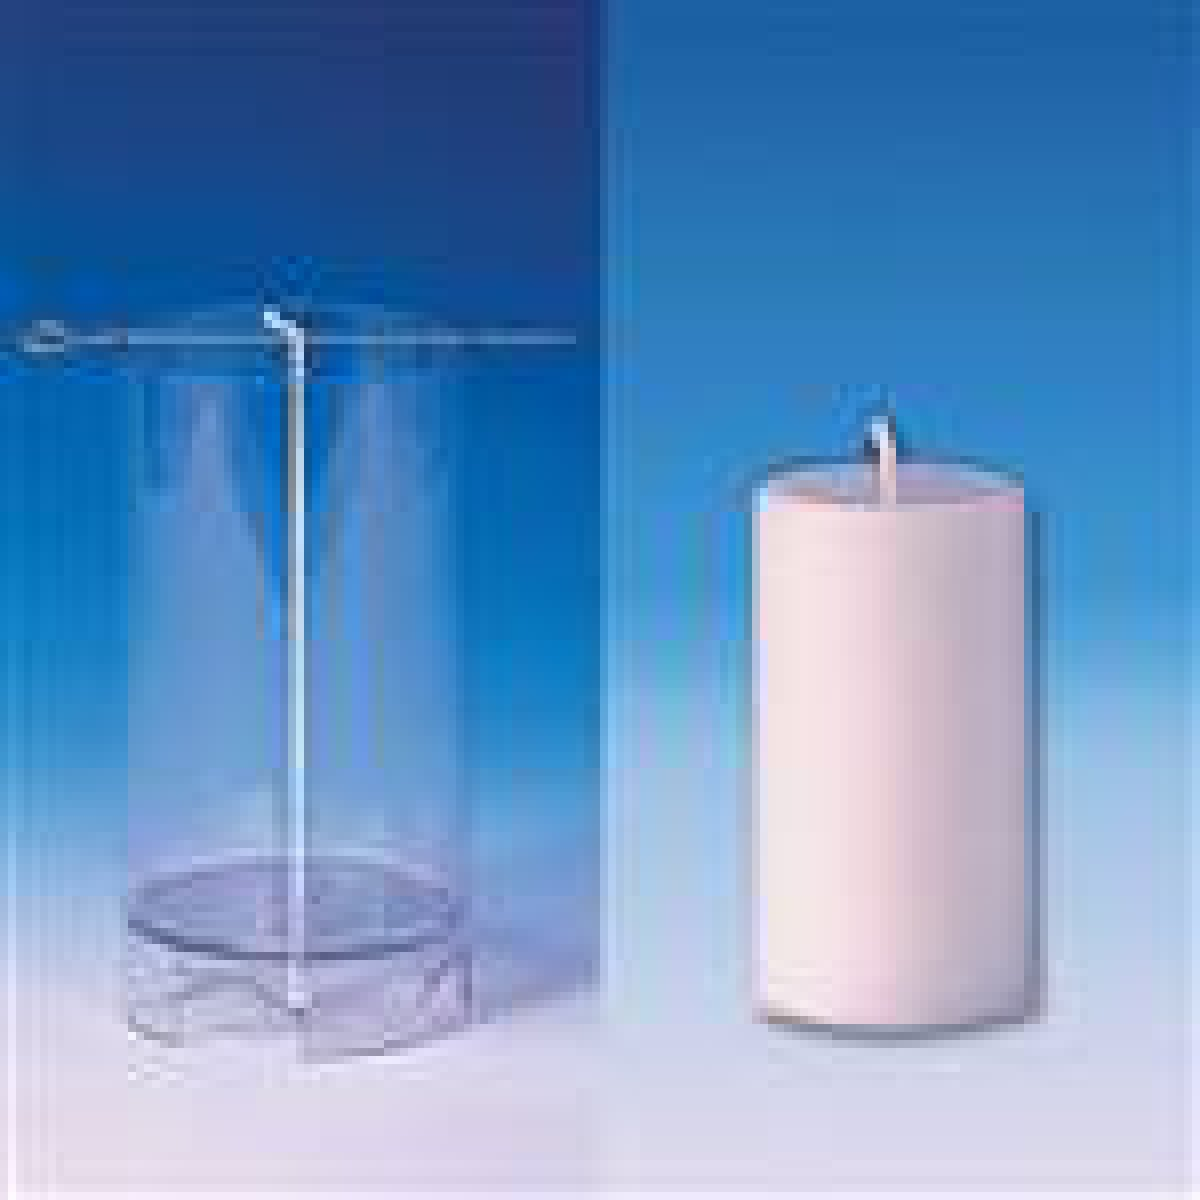 moule pour bougie cylindrique sommet plat 62 x 107 mm. Black Bedroom Furniture Sets. Home Design Ideas